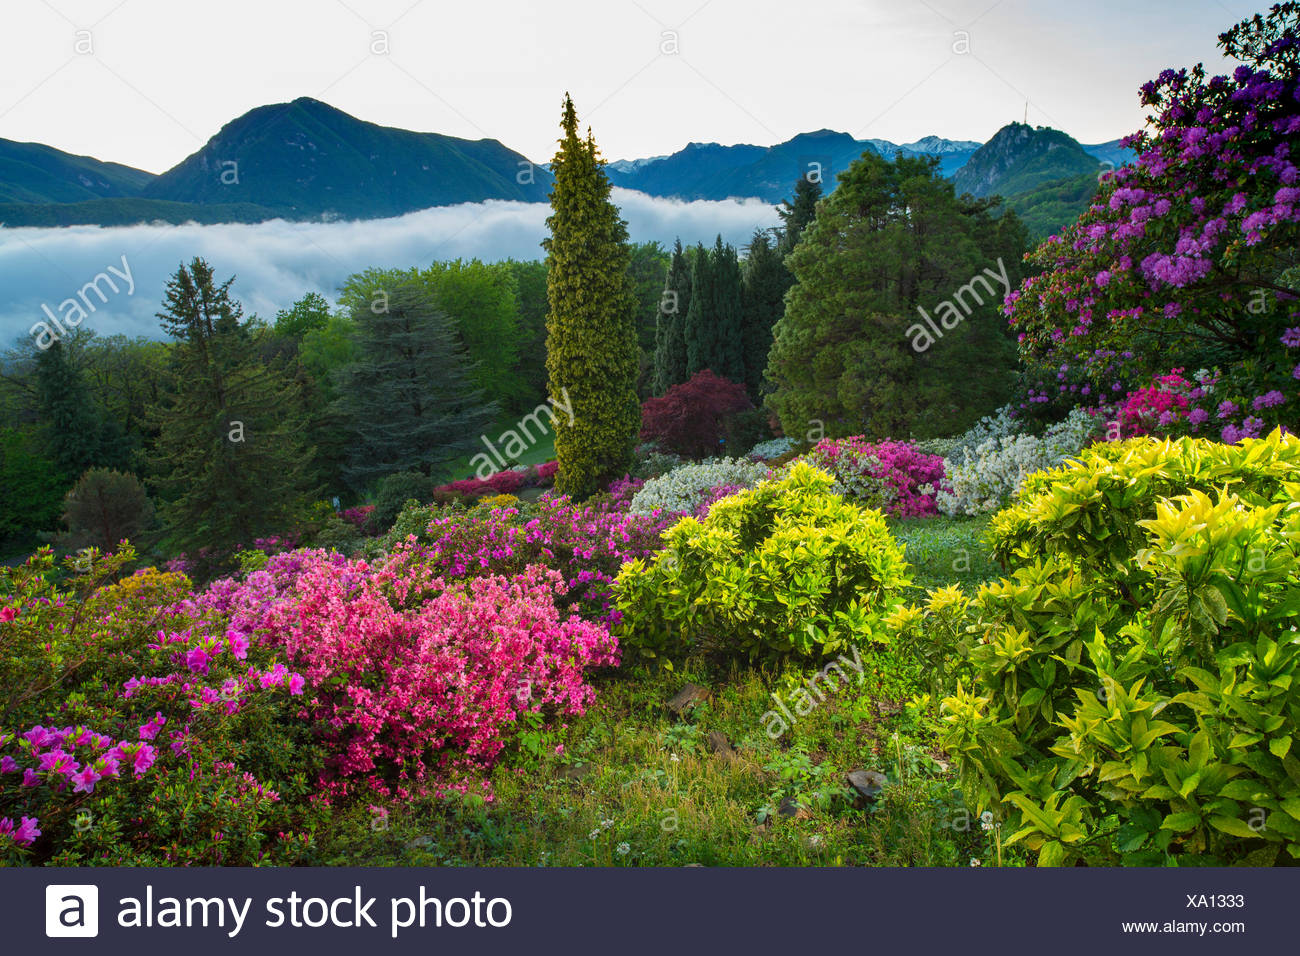 Parco San Grato, rhododendron, Carona, Lake Lugano, flower, flowers, nature, canton, Ticino, Southern Switzerland, Switzerland, - Stock Image